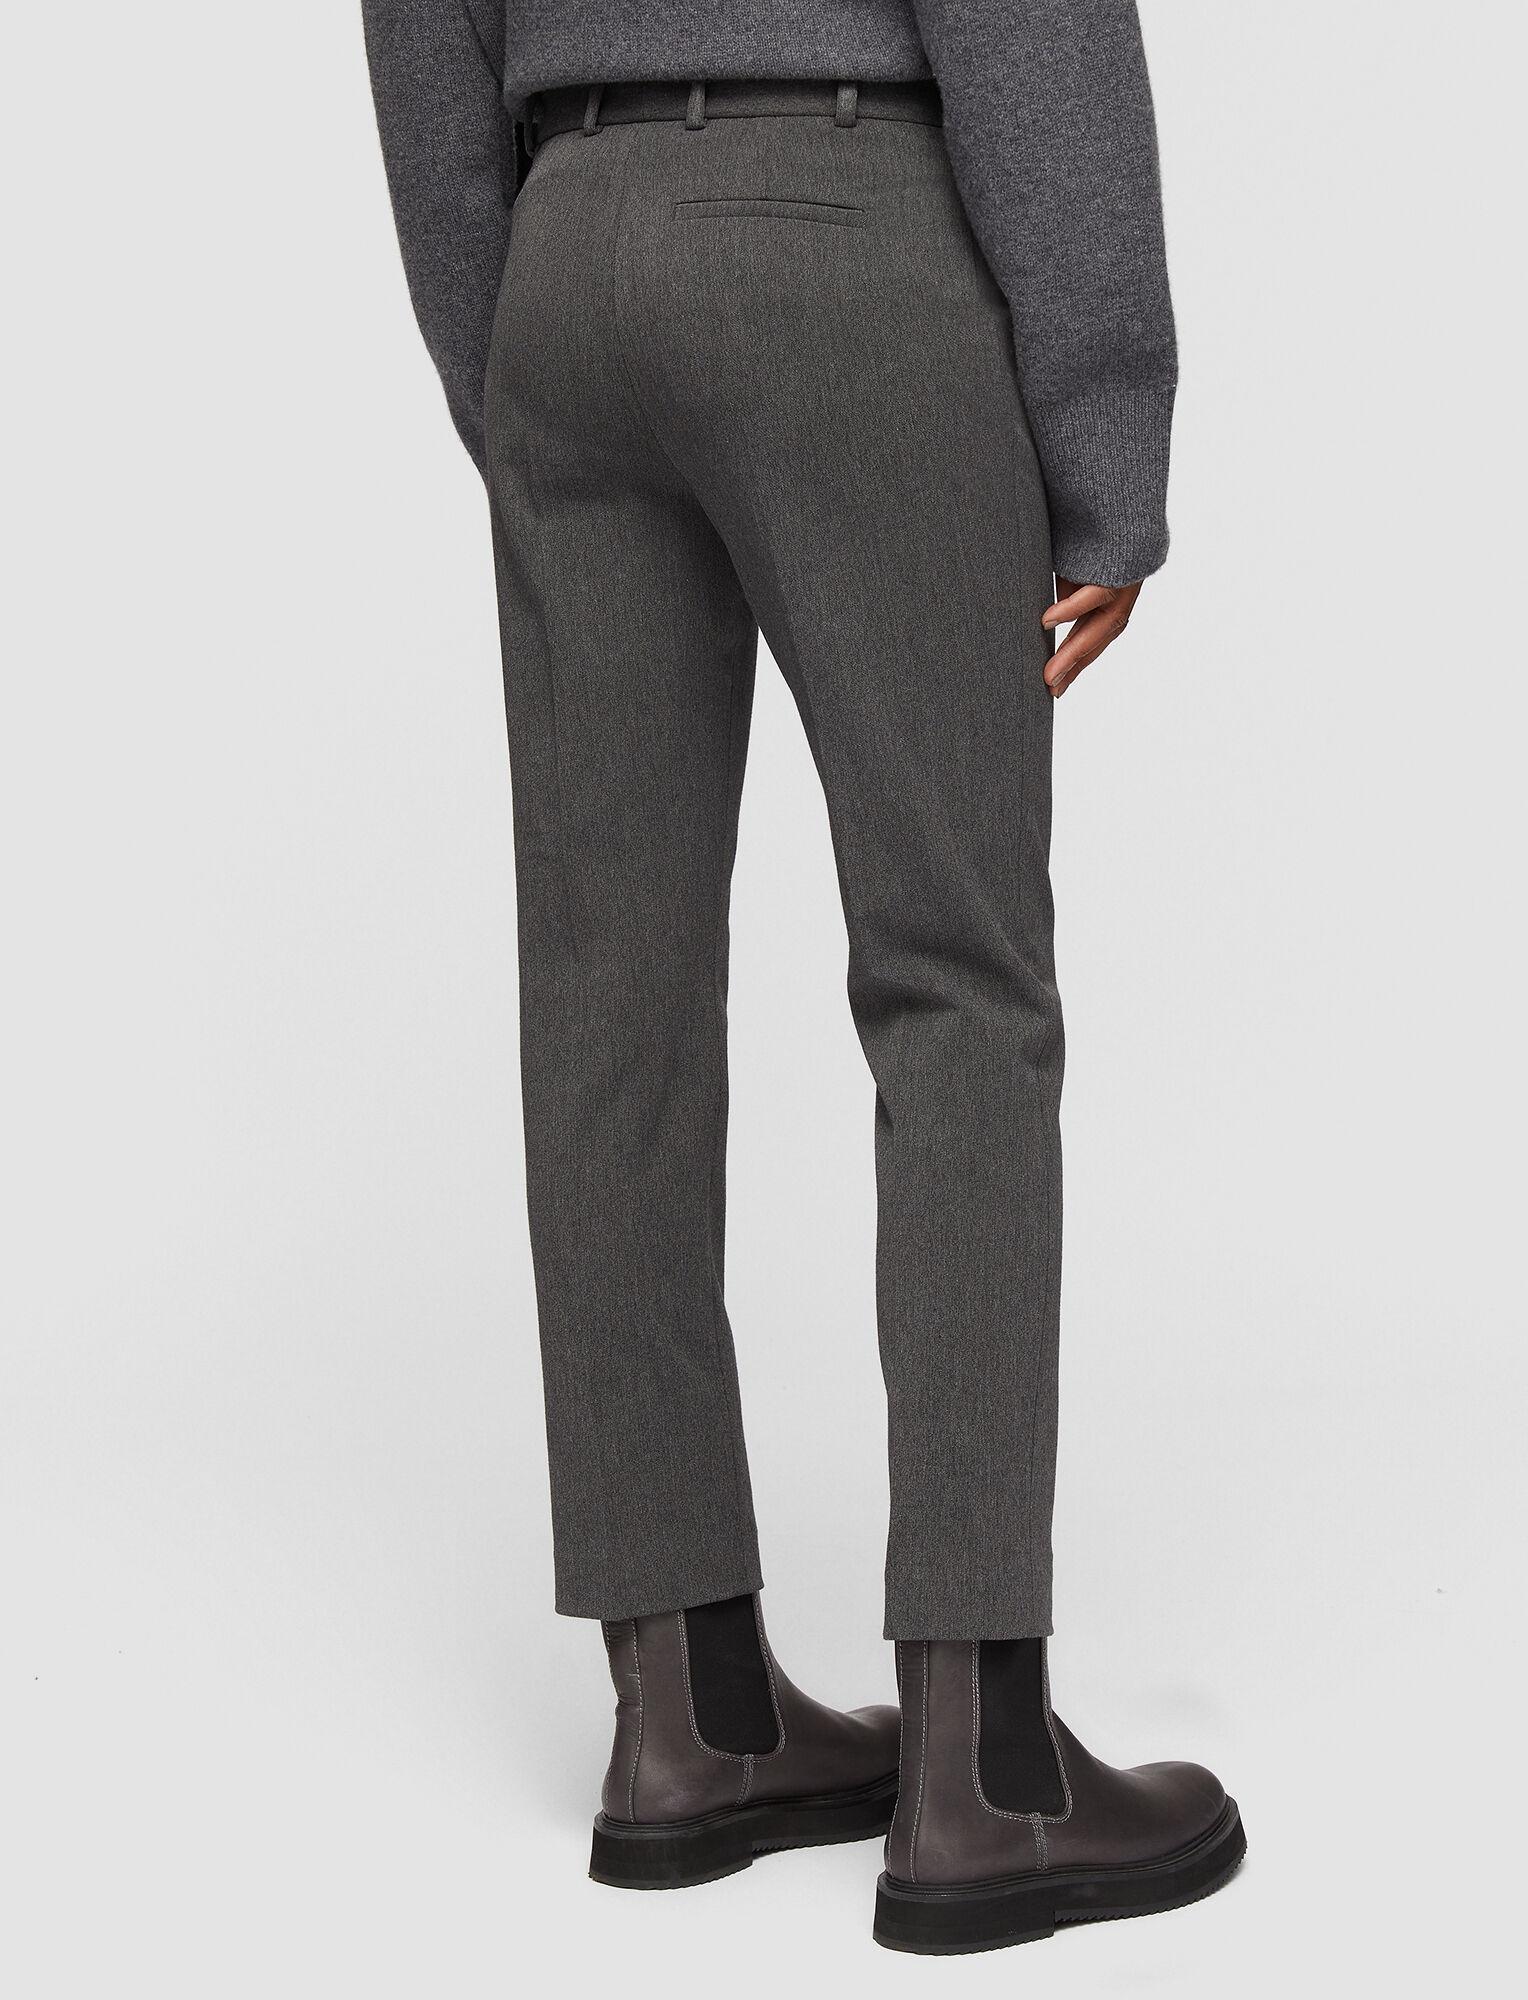 Joseph, Melange Gabardine Stretch Tahis Trousers, in STONE